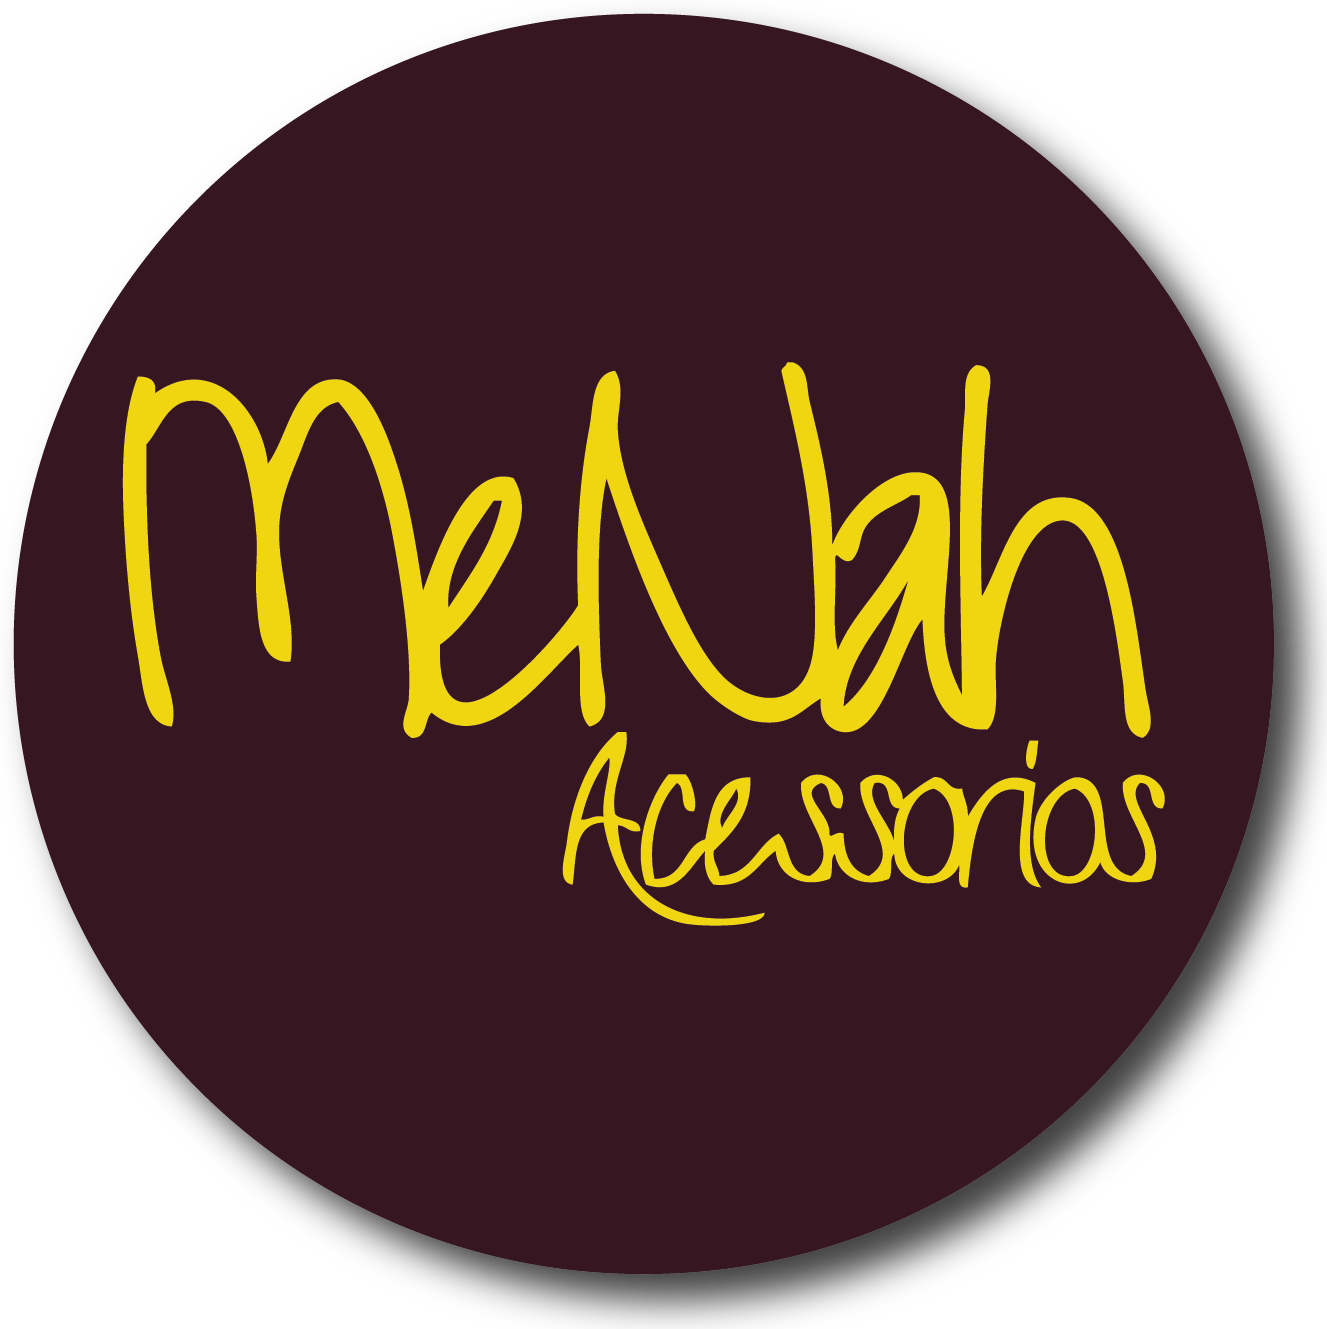 https://www.facebook.com/menahacessorios?fref=ts